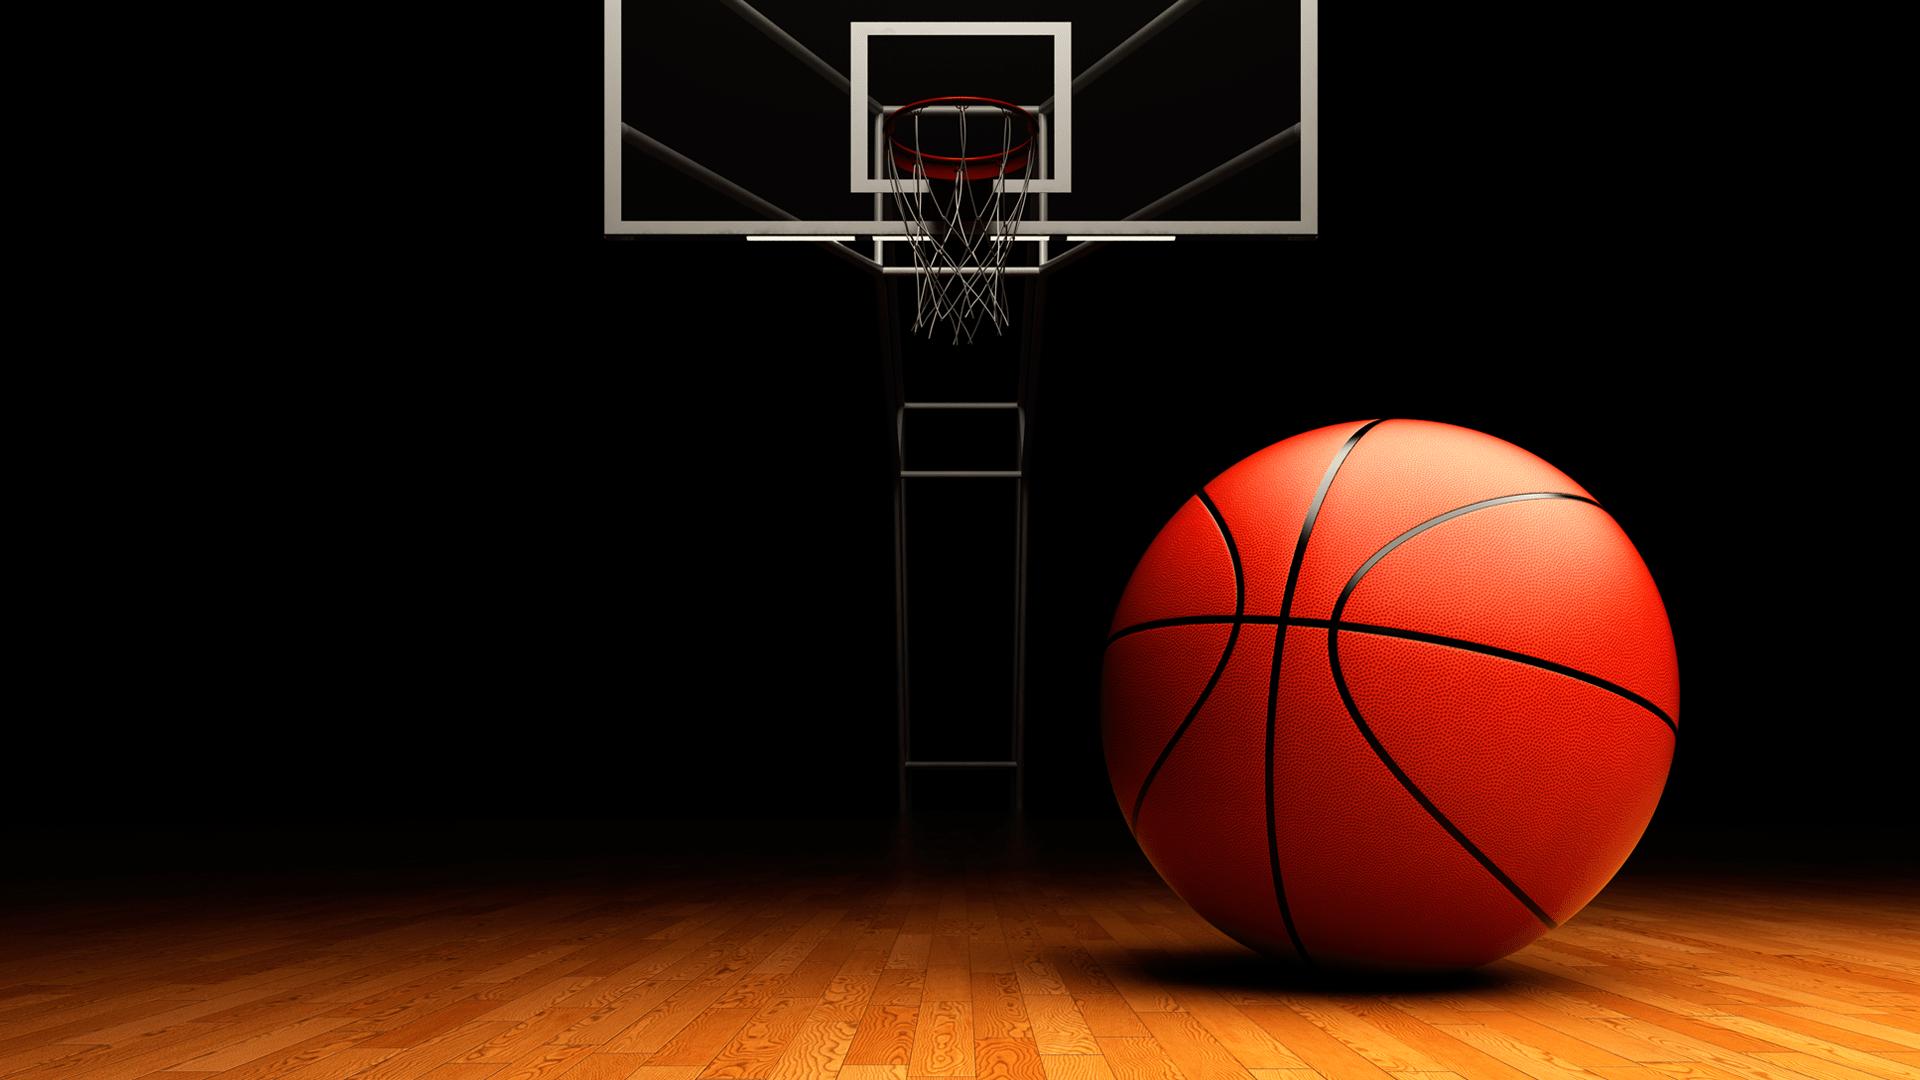 basketball-generic-trips_309791